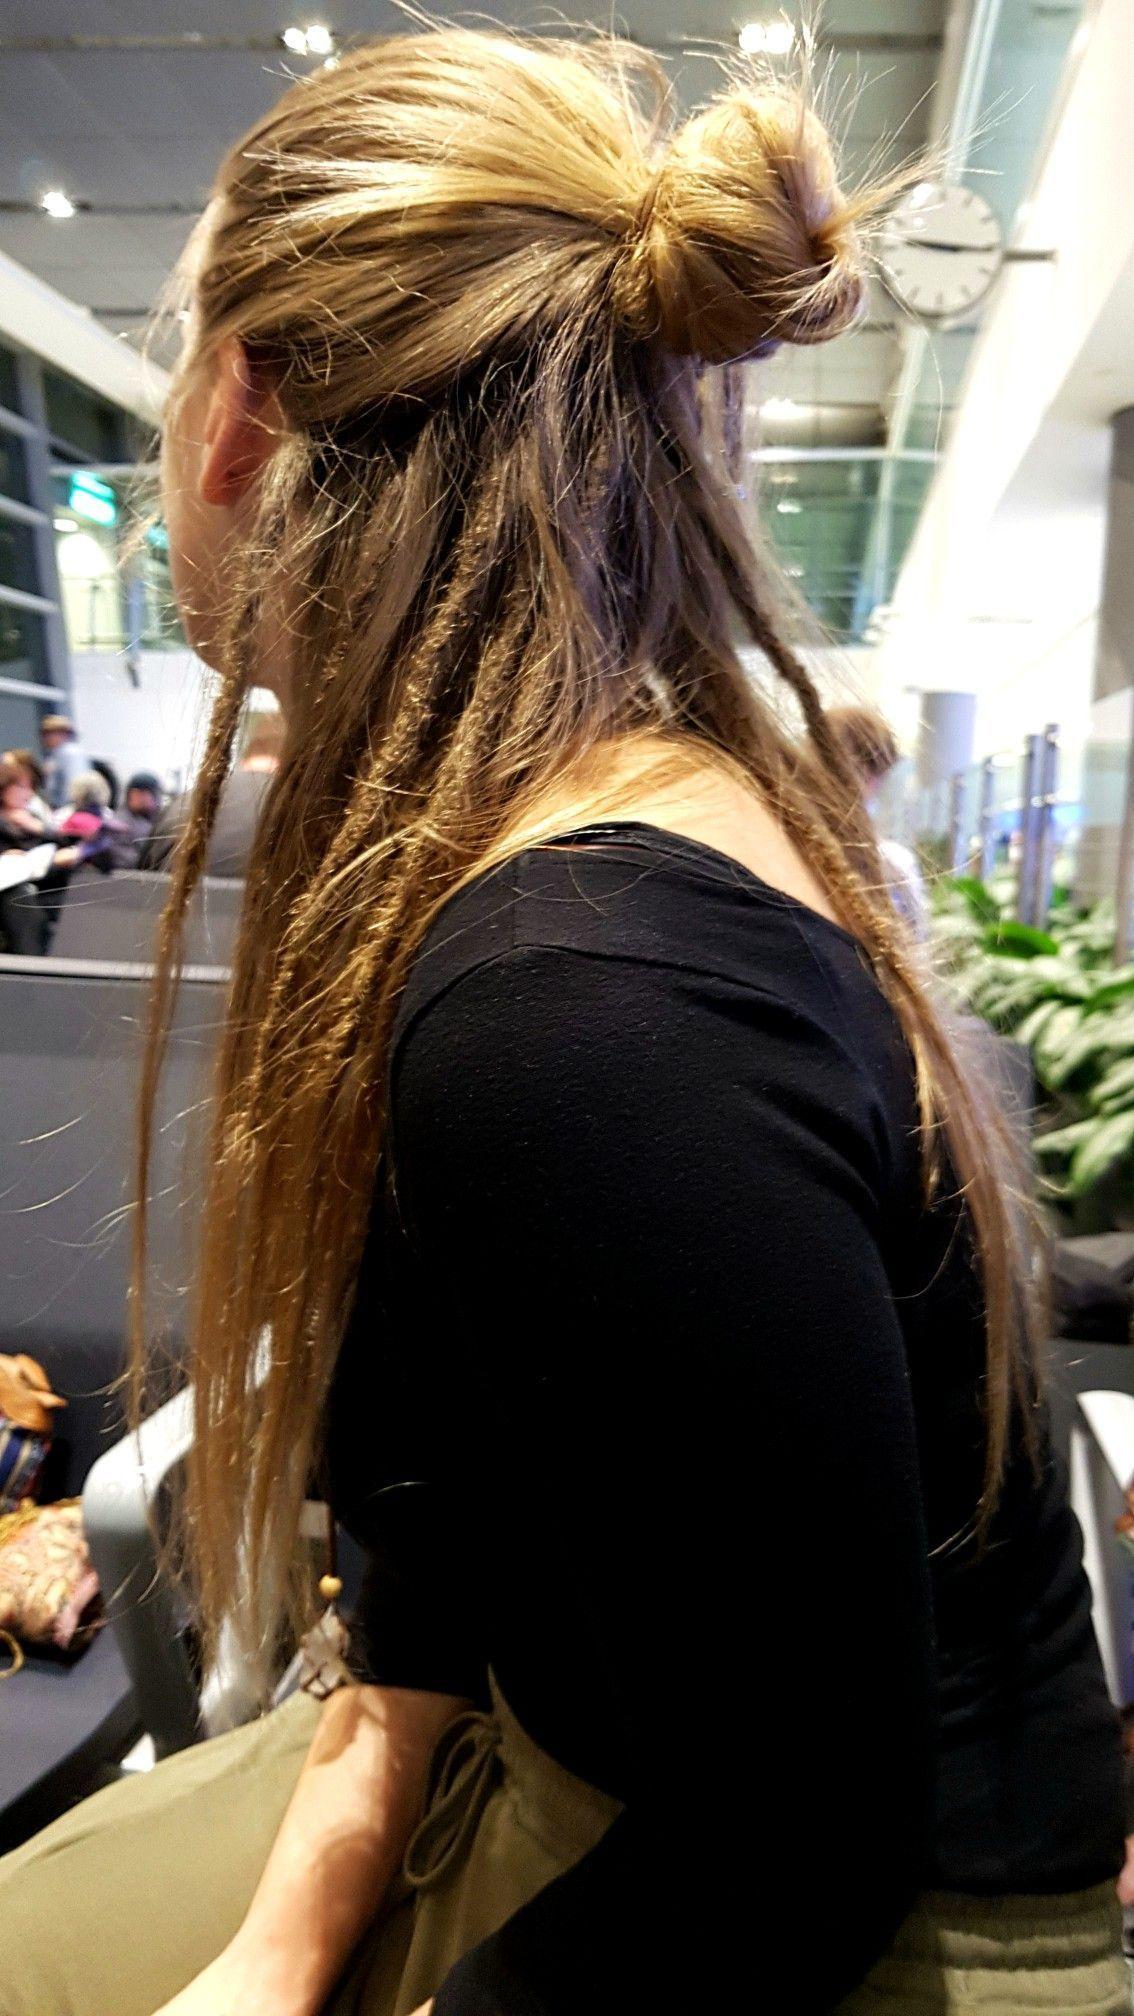 Dread Bun 🙆 @ginevra_zen # rasta Braids frisuren - Popular